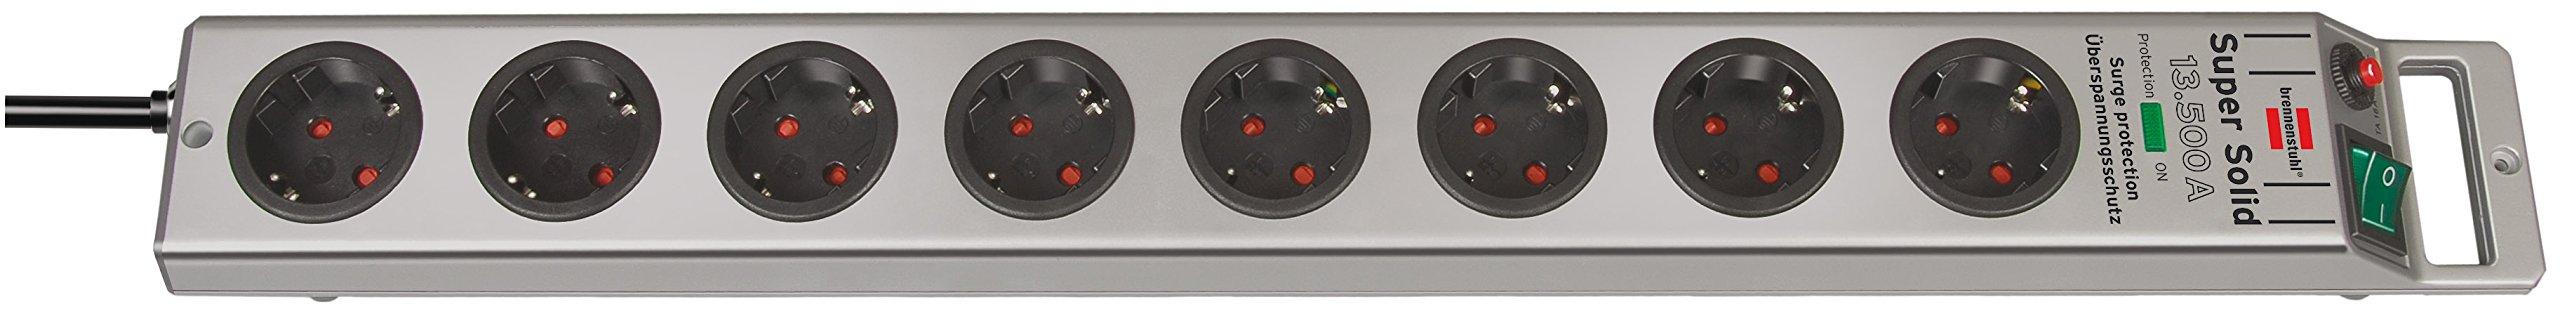 Brennenstuhl 1153340318 Regleta contra Subidas de Tensión, 230 V, Plata, 63 cm product image